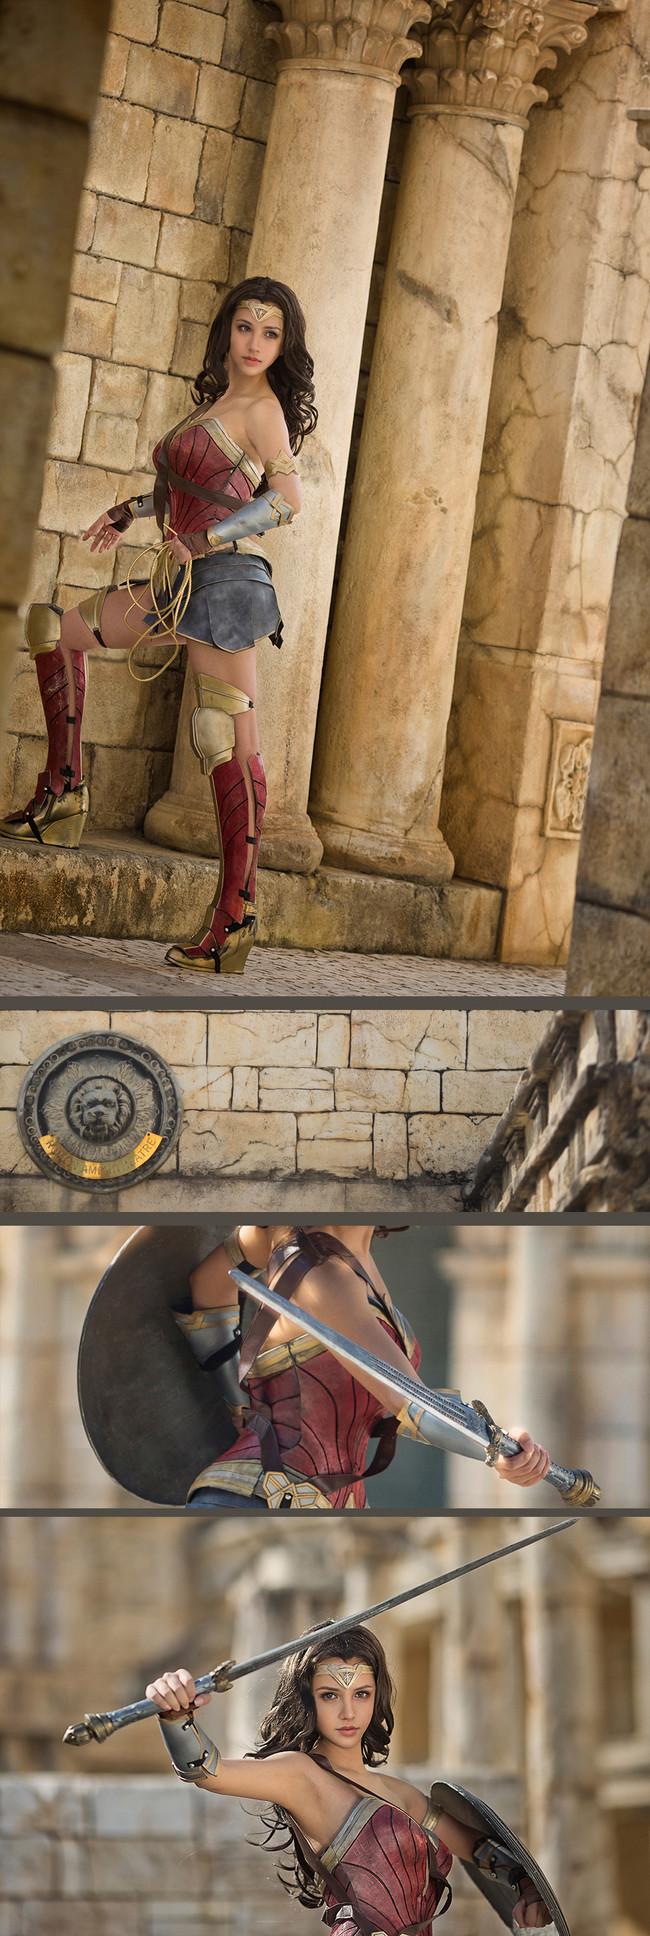 神奇女侠,cosplay,kilory